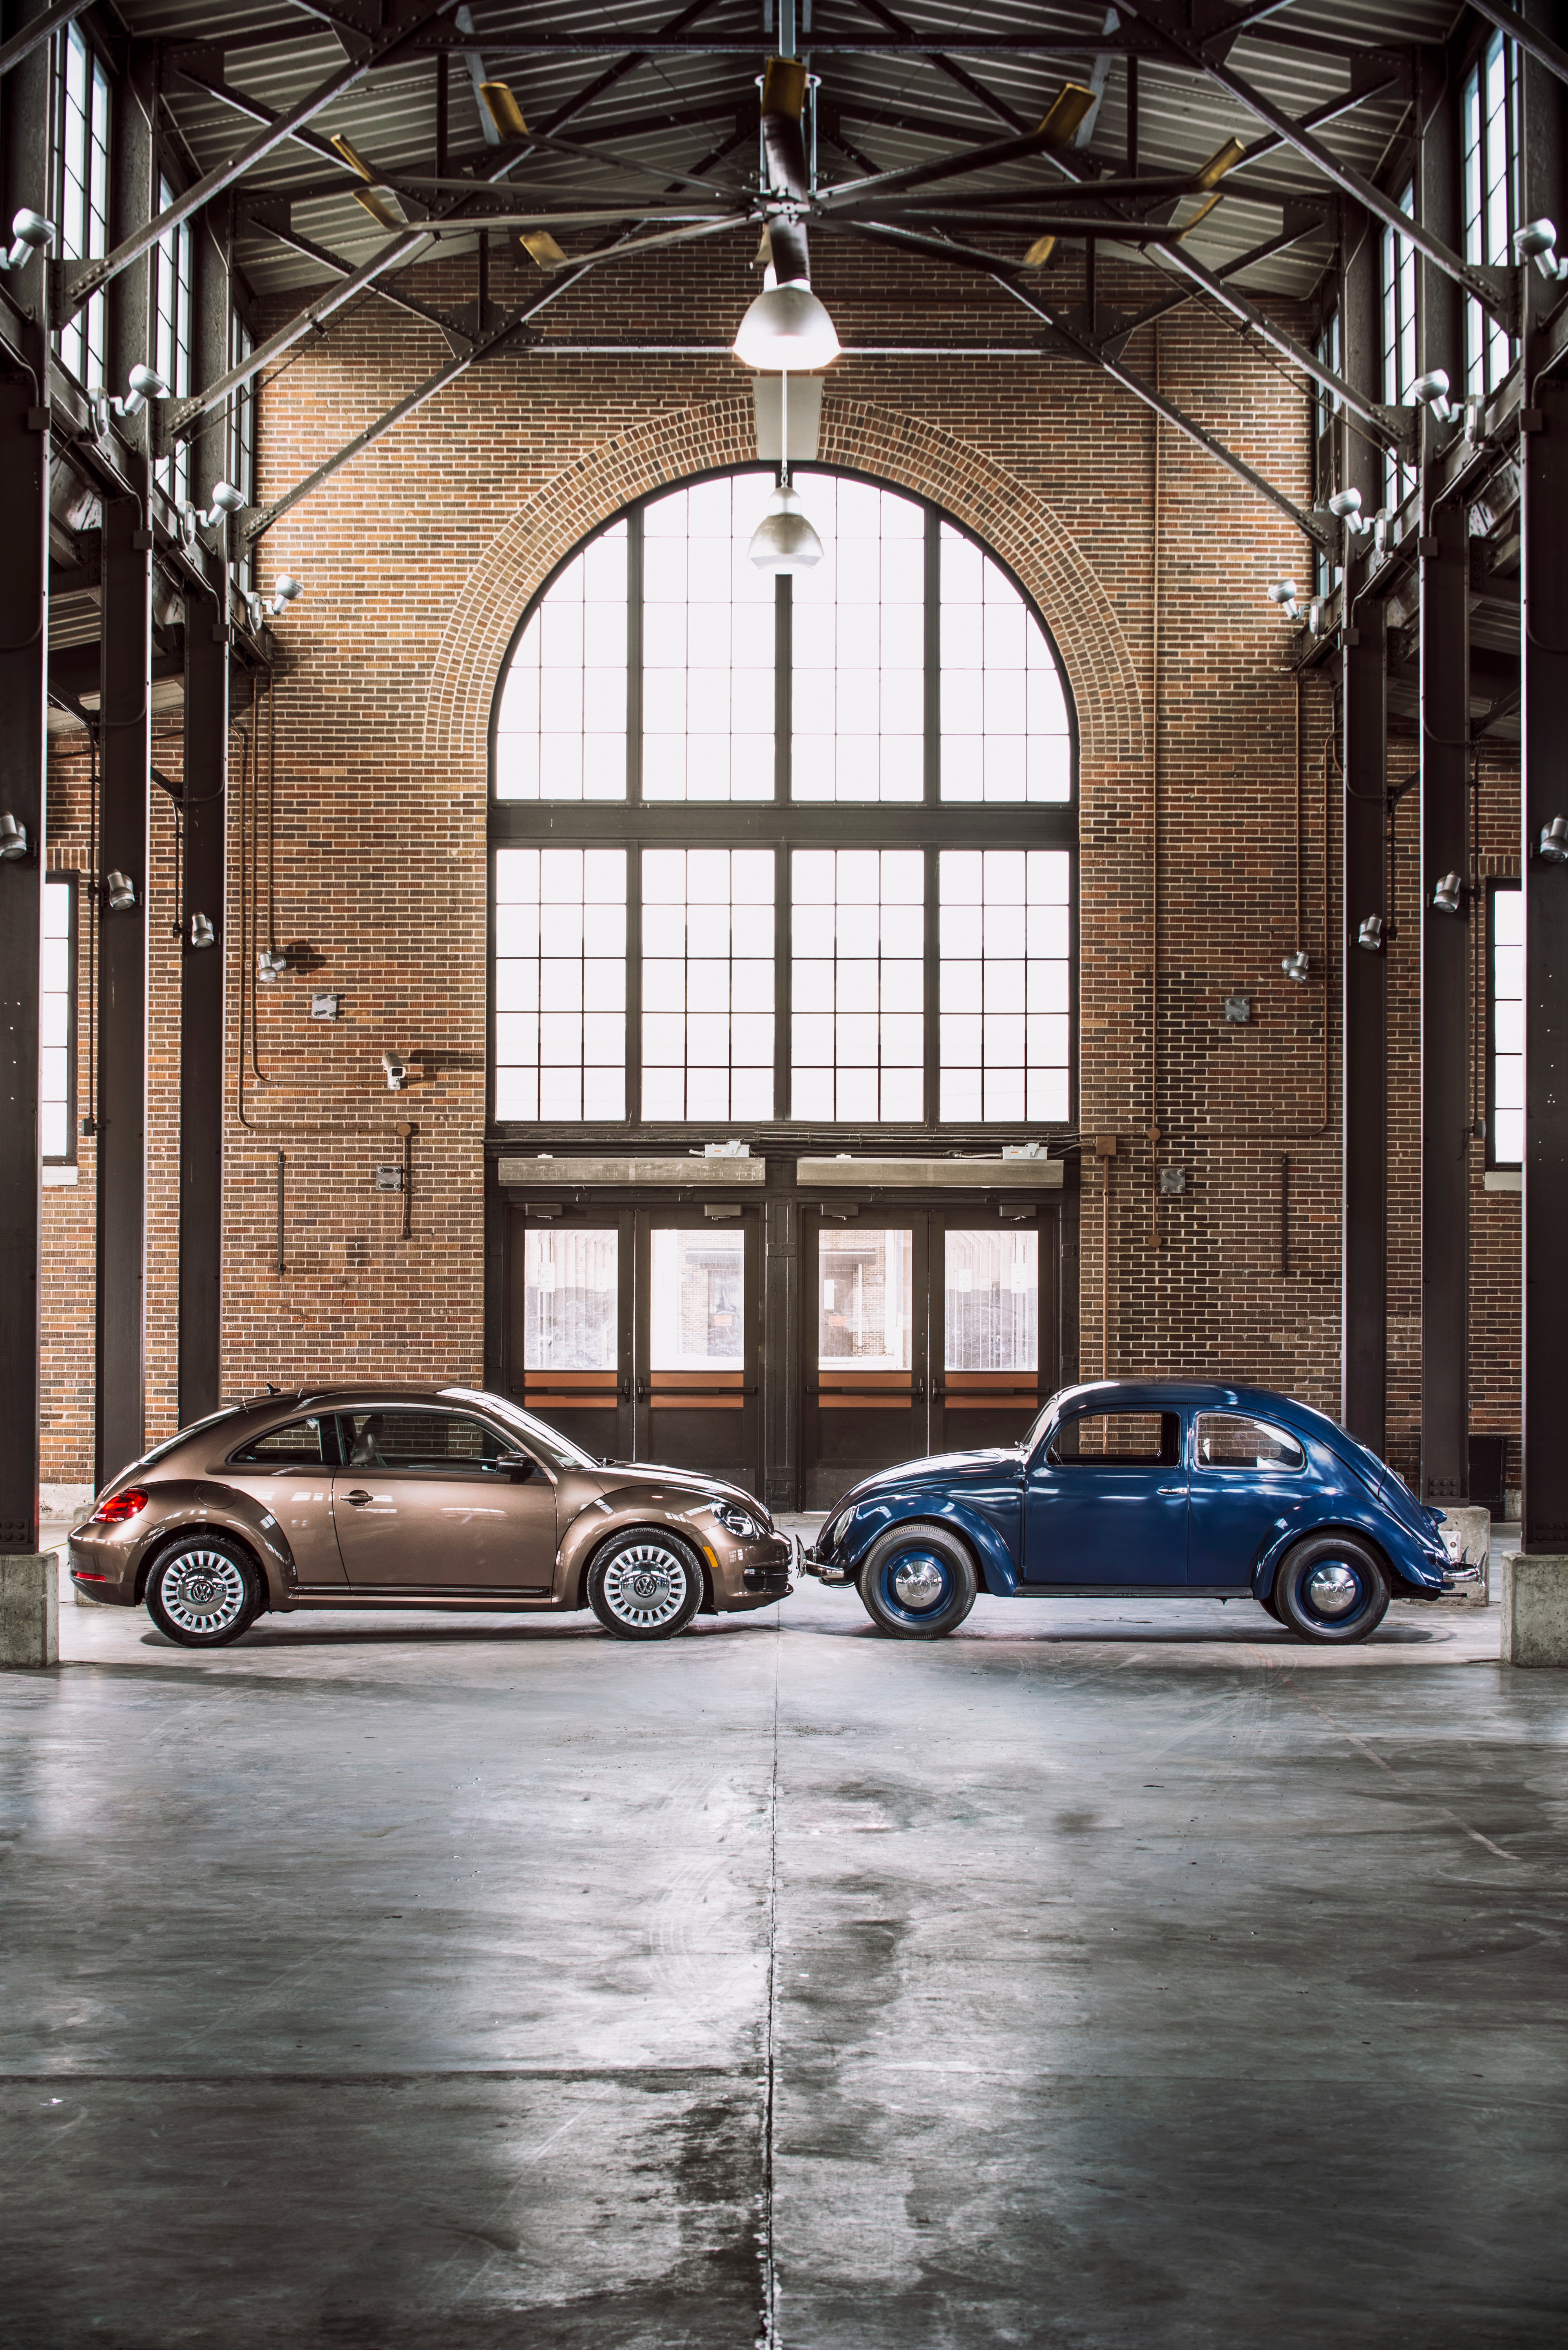 brampton burlington stock getvdpimage beetle cabriolet classic oakville toronto and volkswagen vaughan ontario mississauga used price tsi